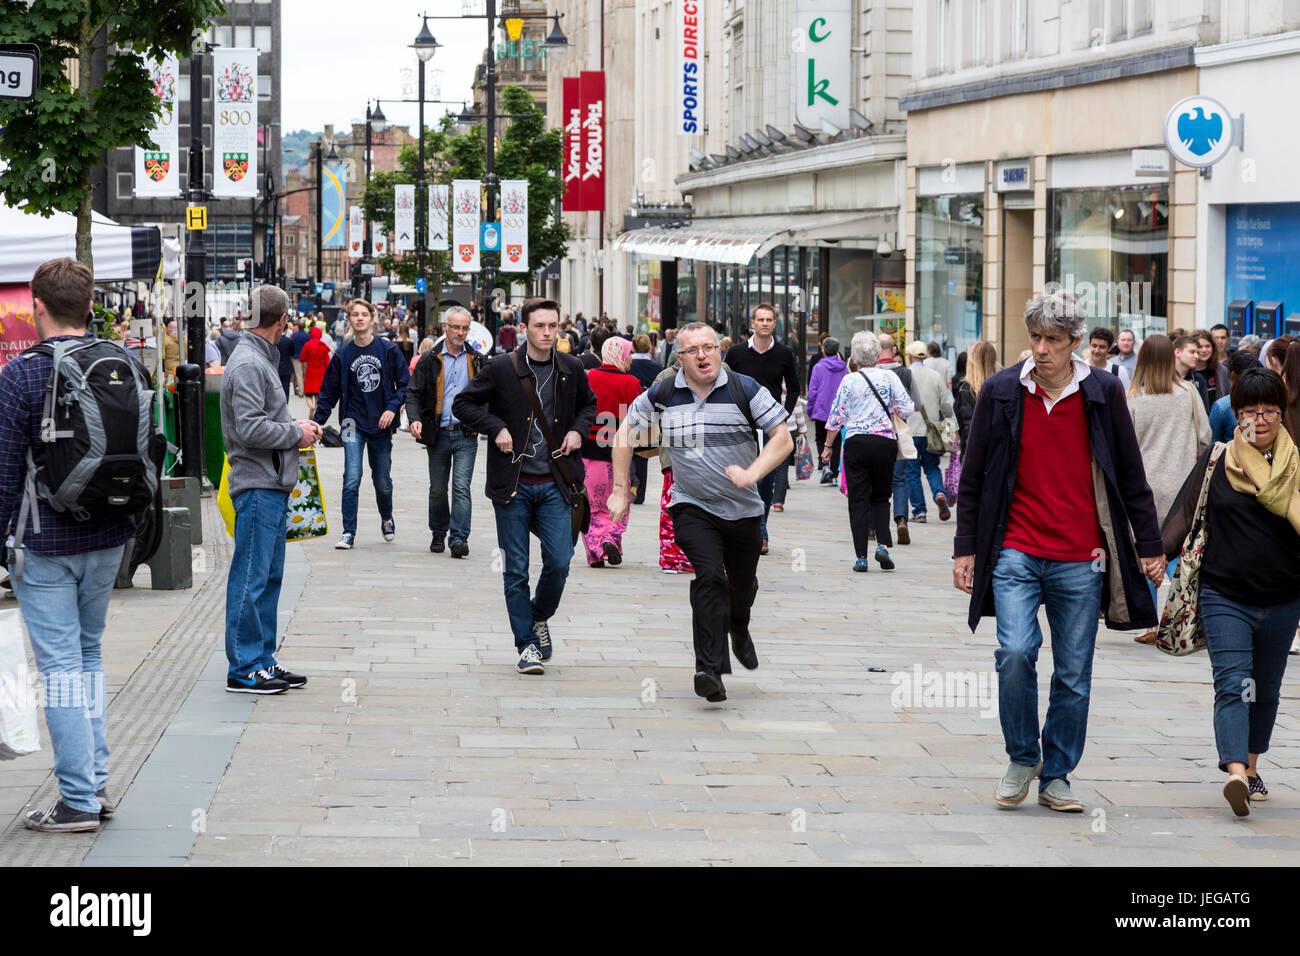 Newcastle-upon-Tyne, Inglaterra, Reino Unido. Northumberland Street Scene, paseos peatonales, tiendas. Imagen De Stock